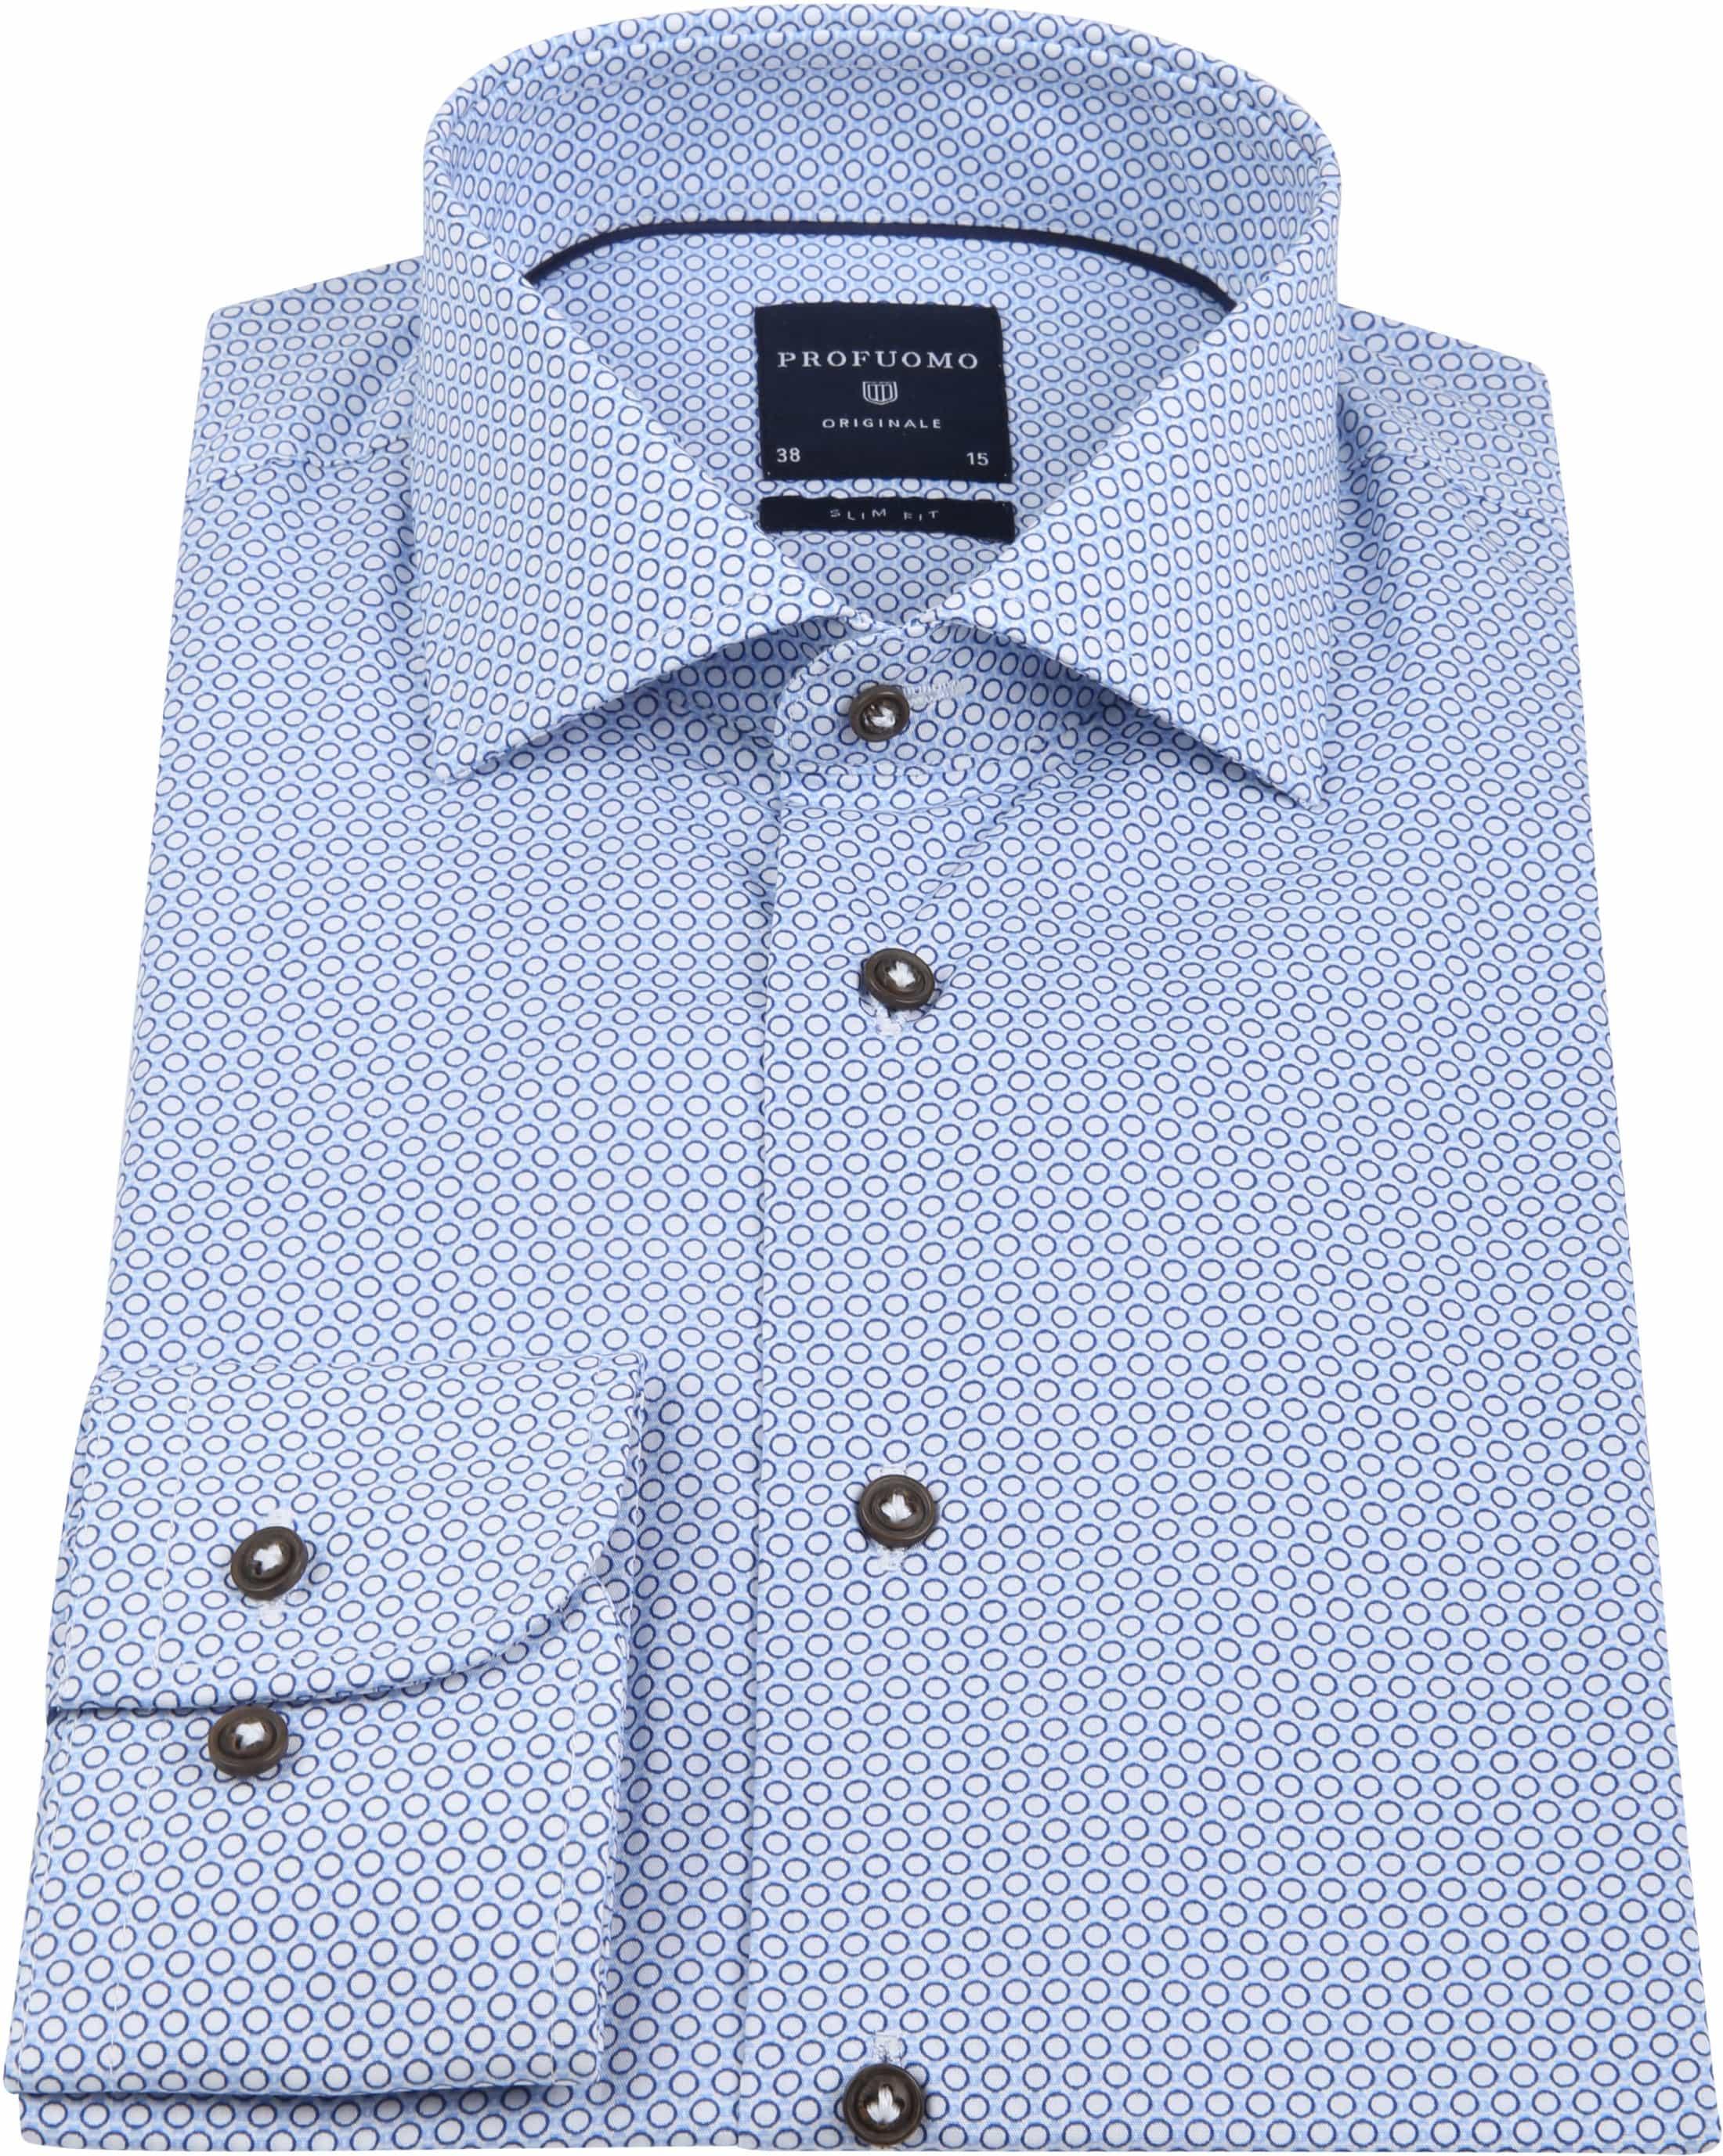 Profuomo Overhemd Slim-Fit Blauw Dessin foto 2